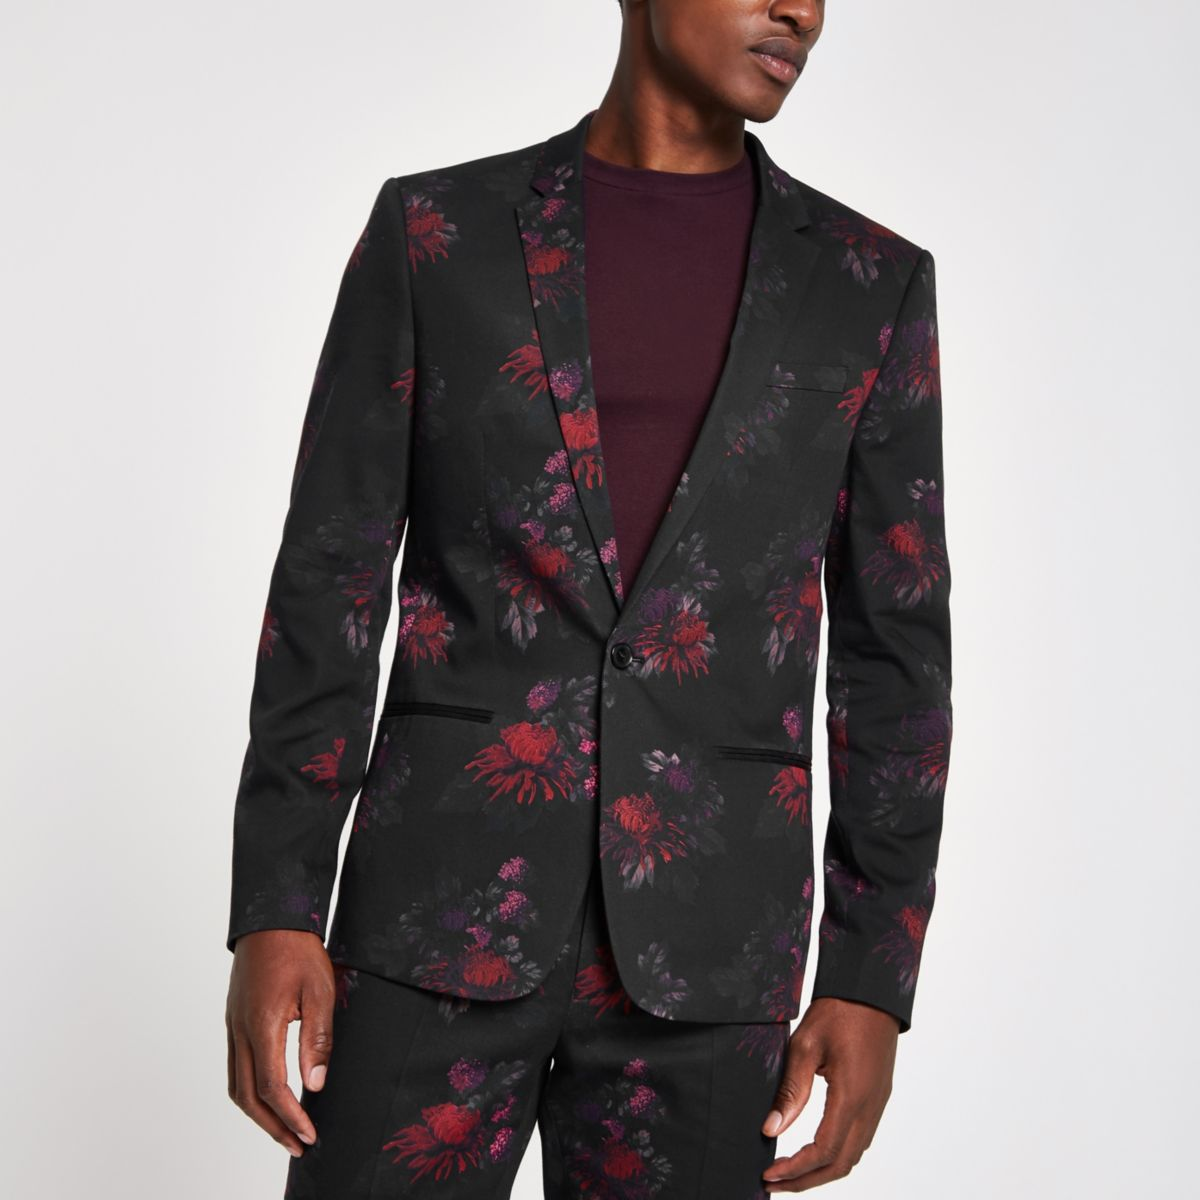 Black floral skinny suit jacket